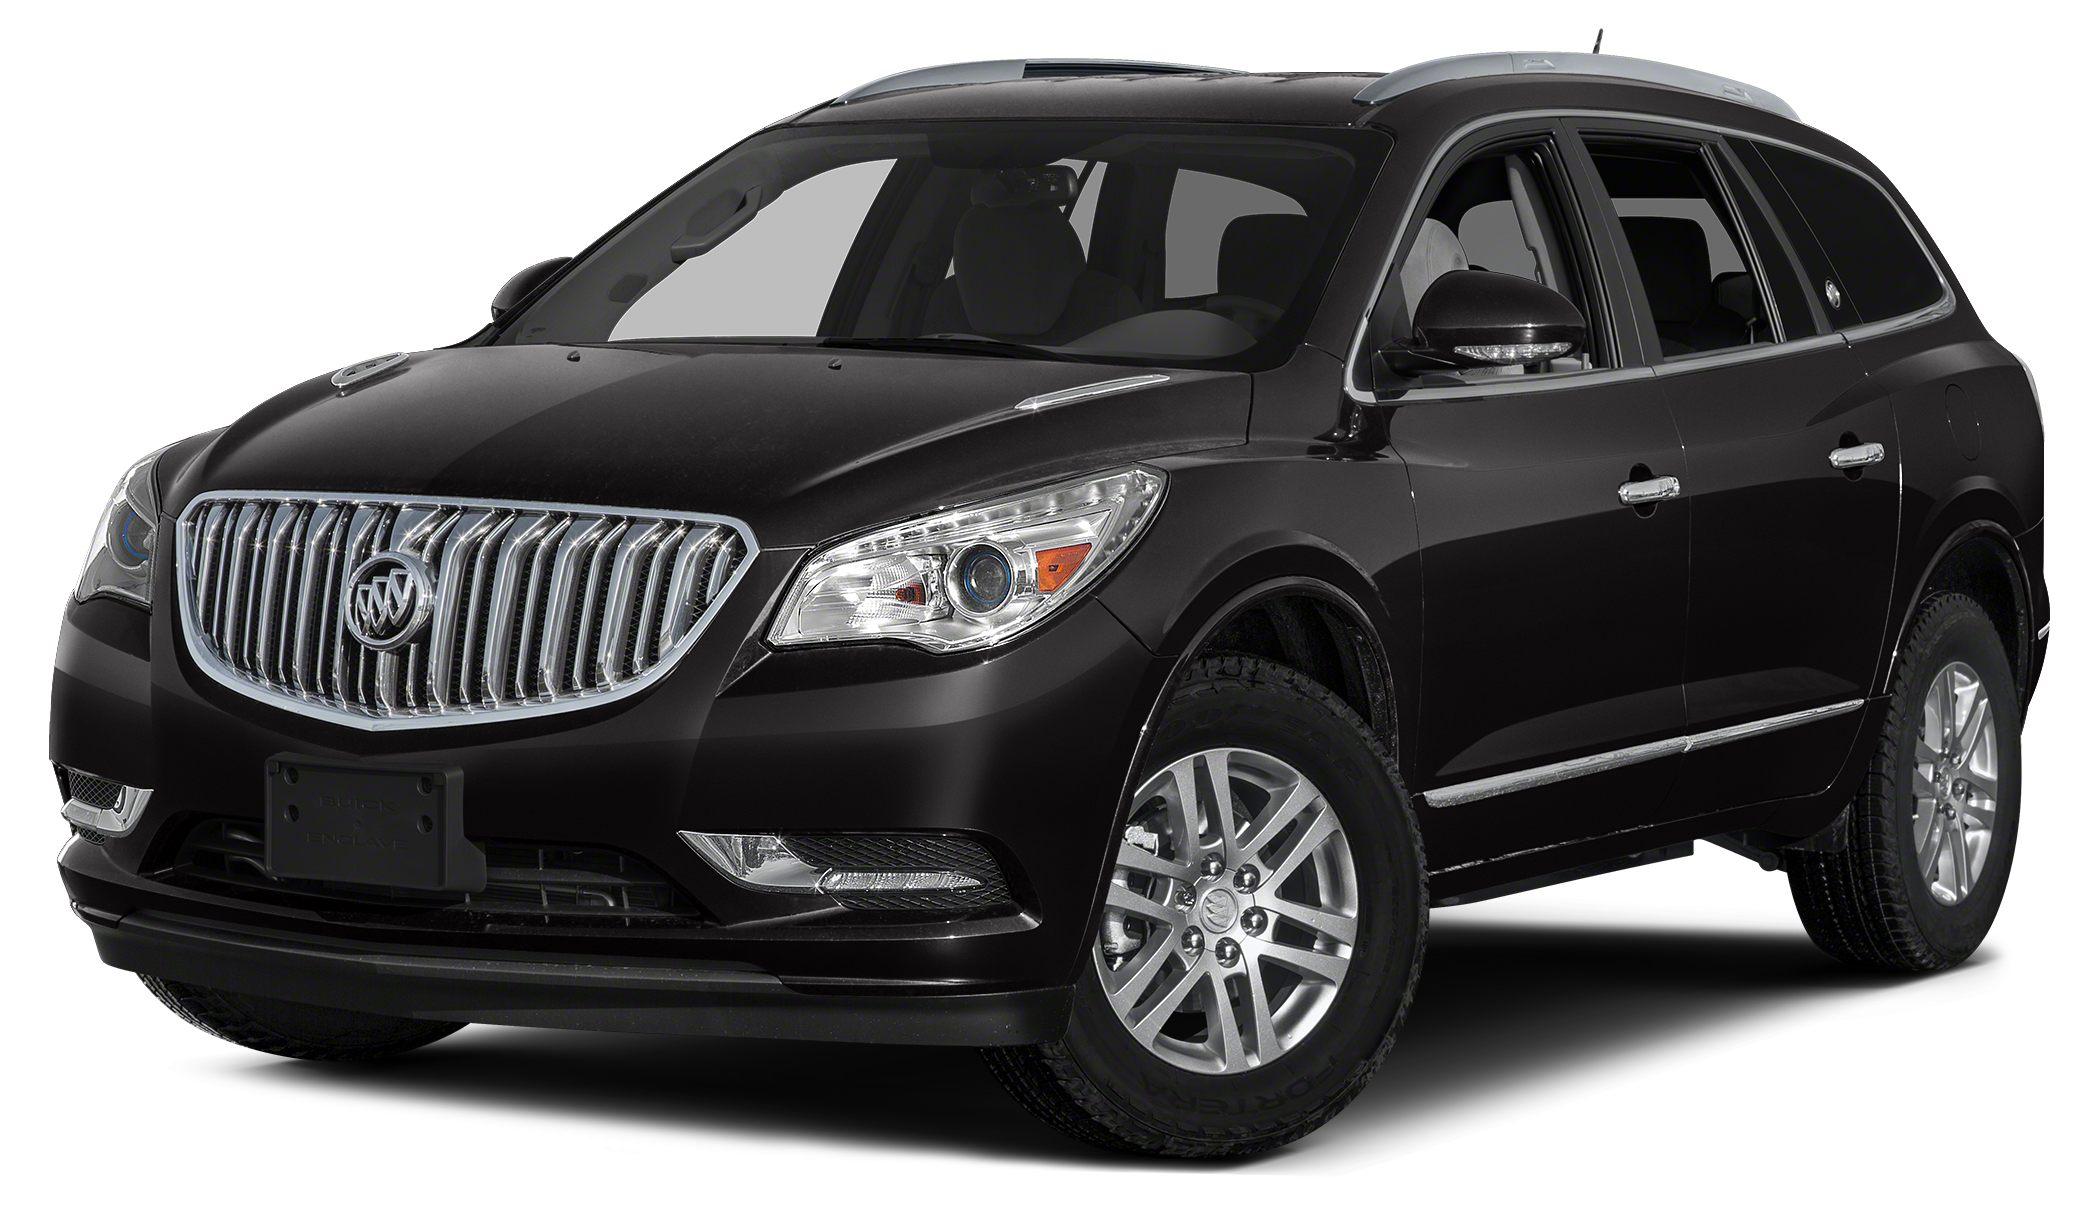 2014 Buick Enclave Premium Enclave Premium Group 4D Sport Utility AWD Articulating Headlights